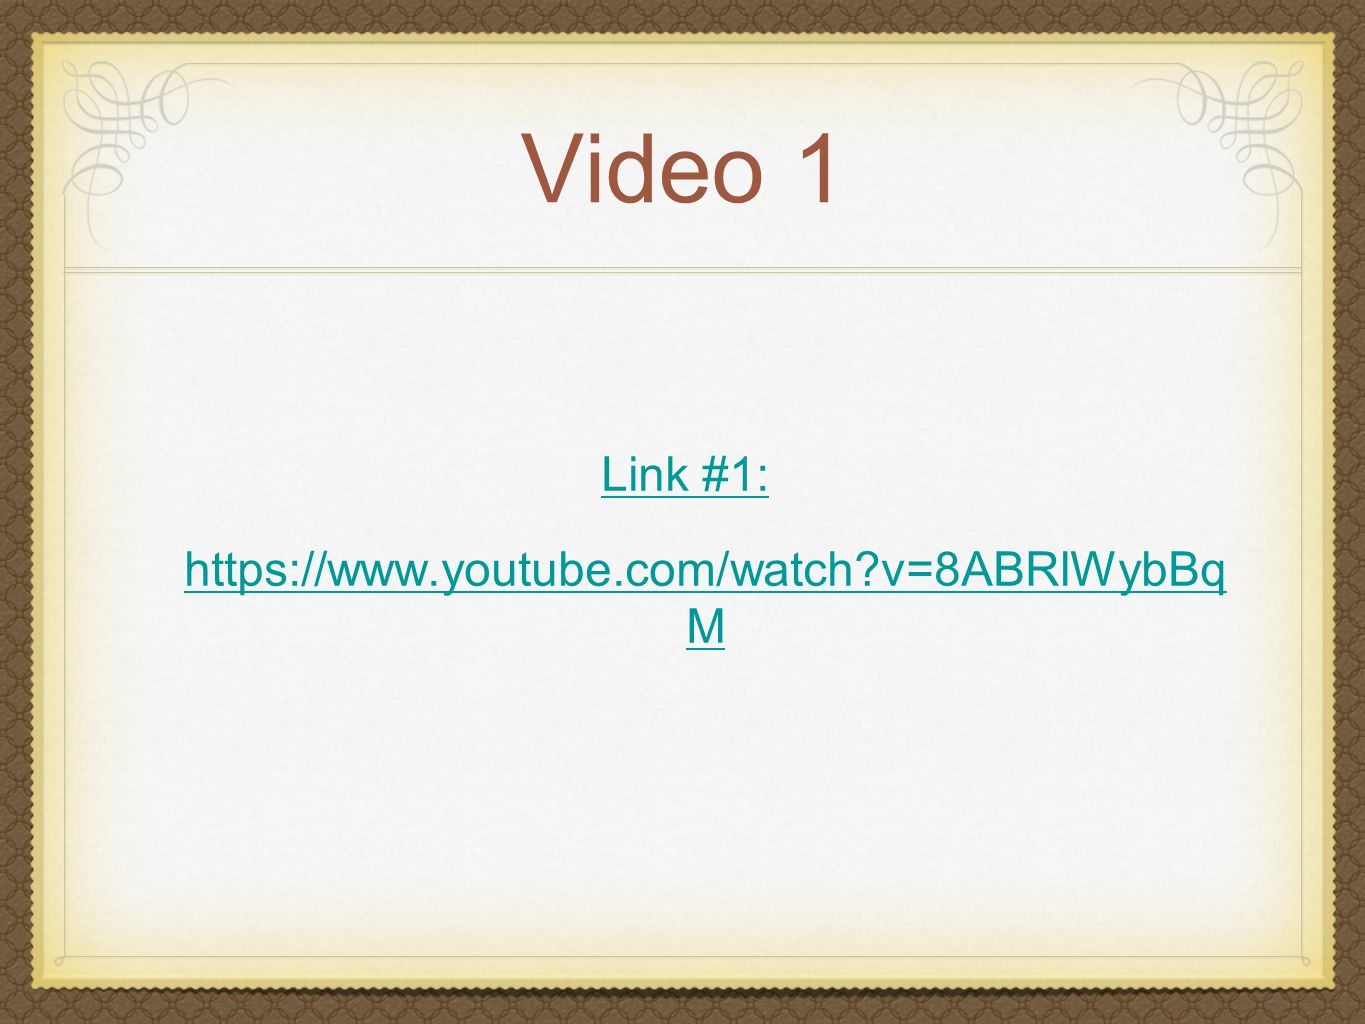 Video 1 Link #1: https://www.youtube.com/watch v=8ABRlWybBq M